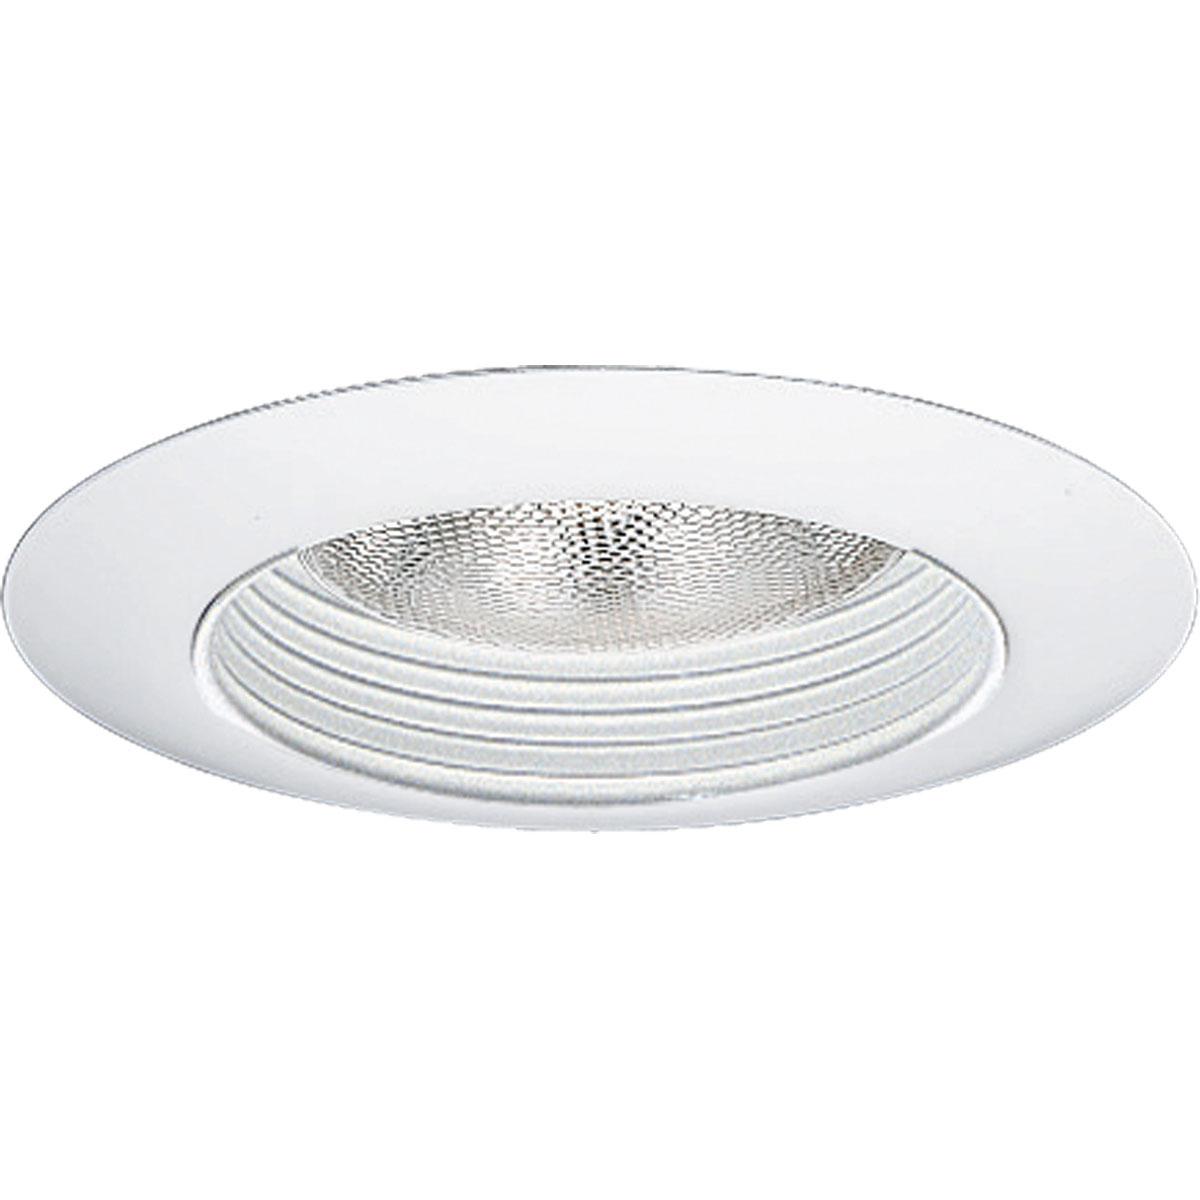 aa16d12e33ce Progress Lighting Recessed Light Step Baffle Trim - White